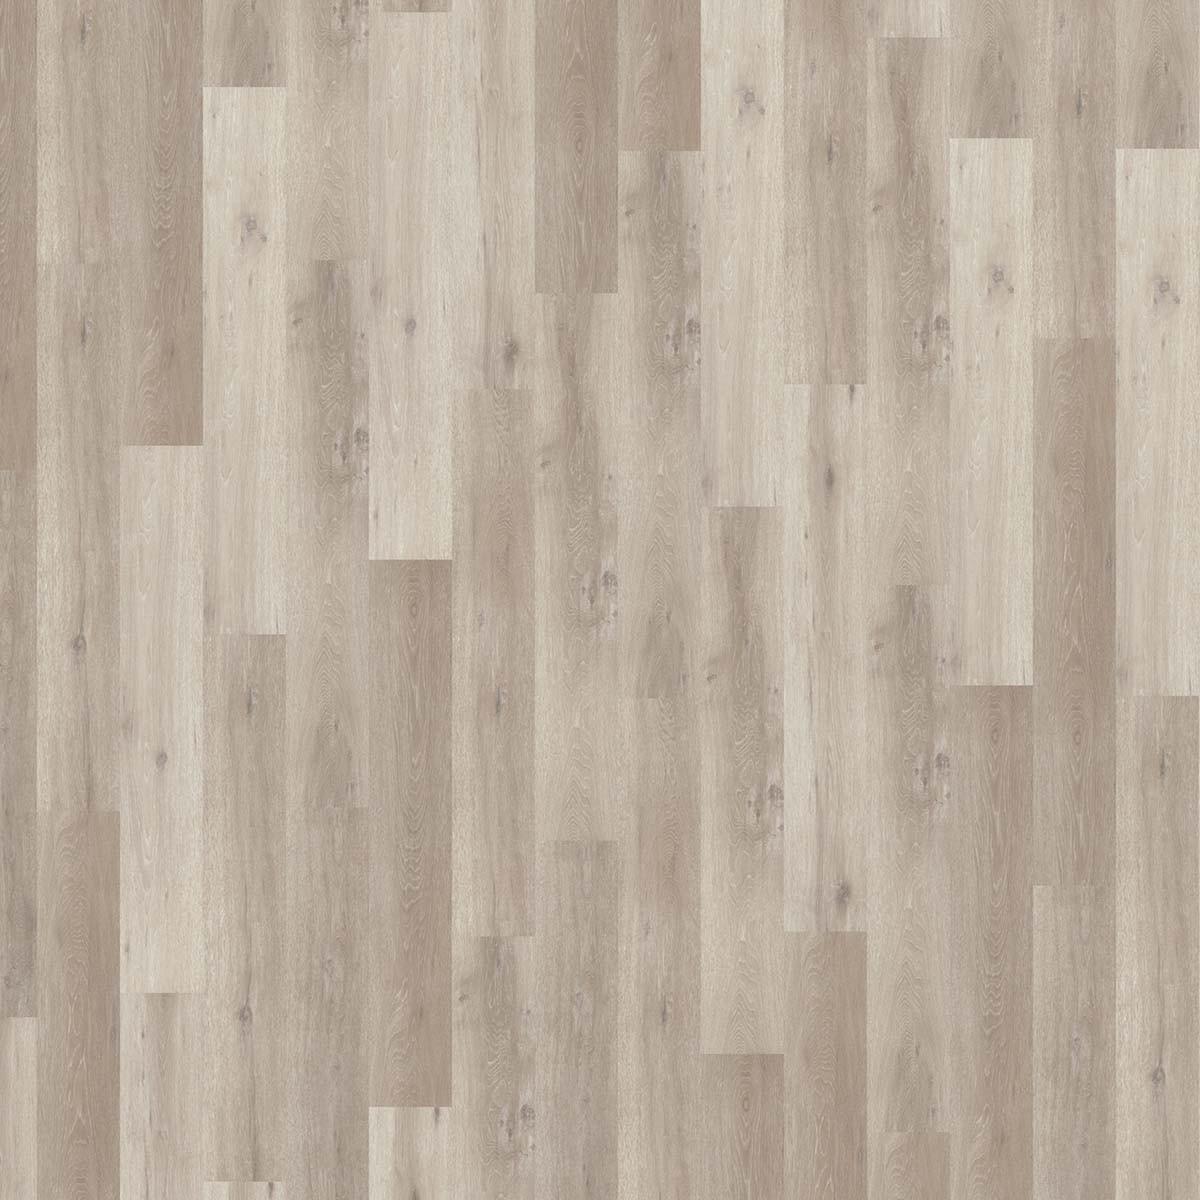 Pavimento in sughero Limed White Rustic Oak